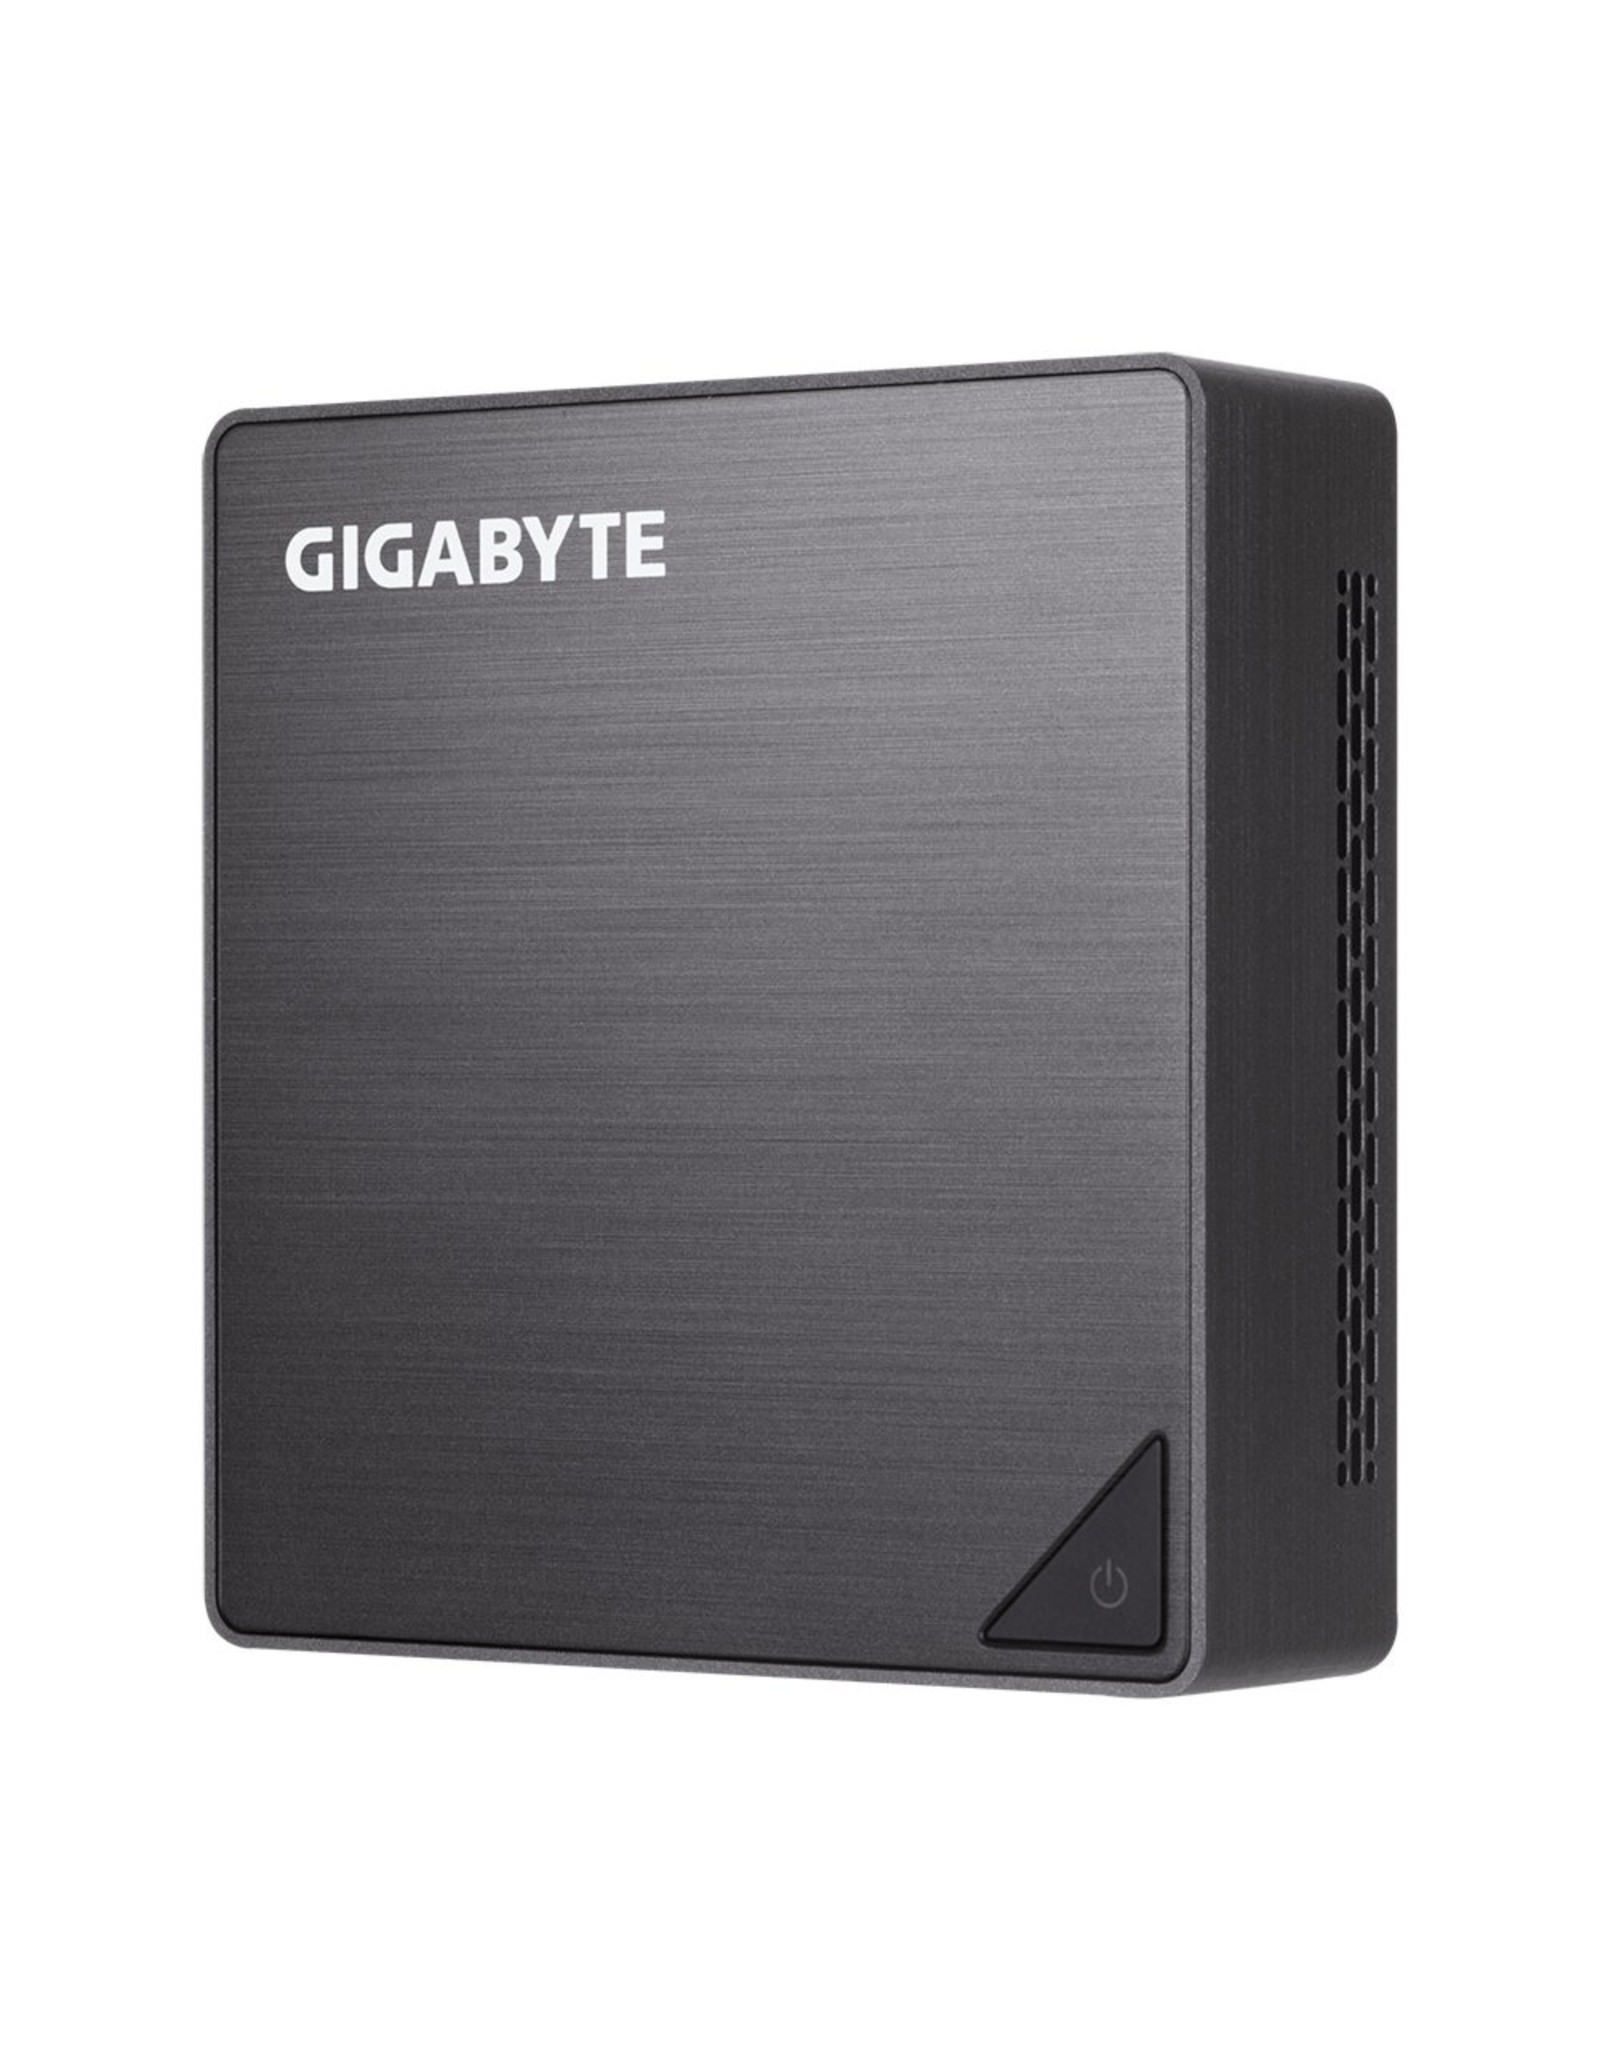 Gigabyte BRIX Barebone UCFF Intel Core i7 8550U